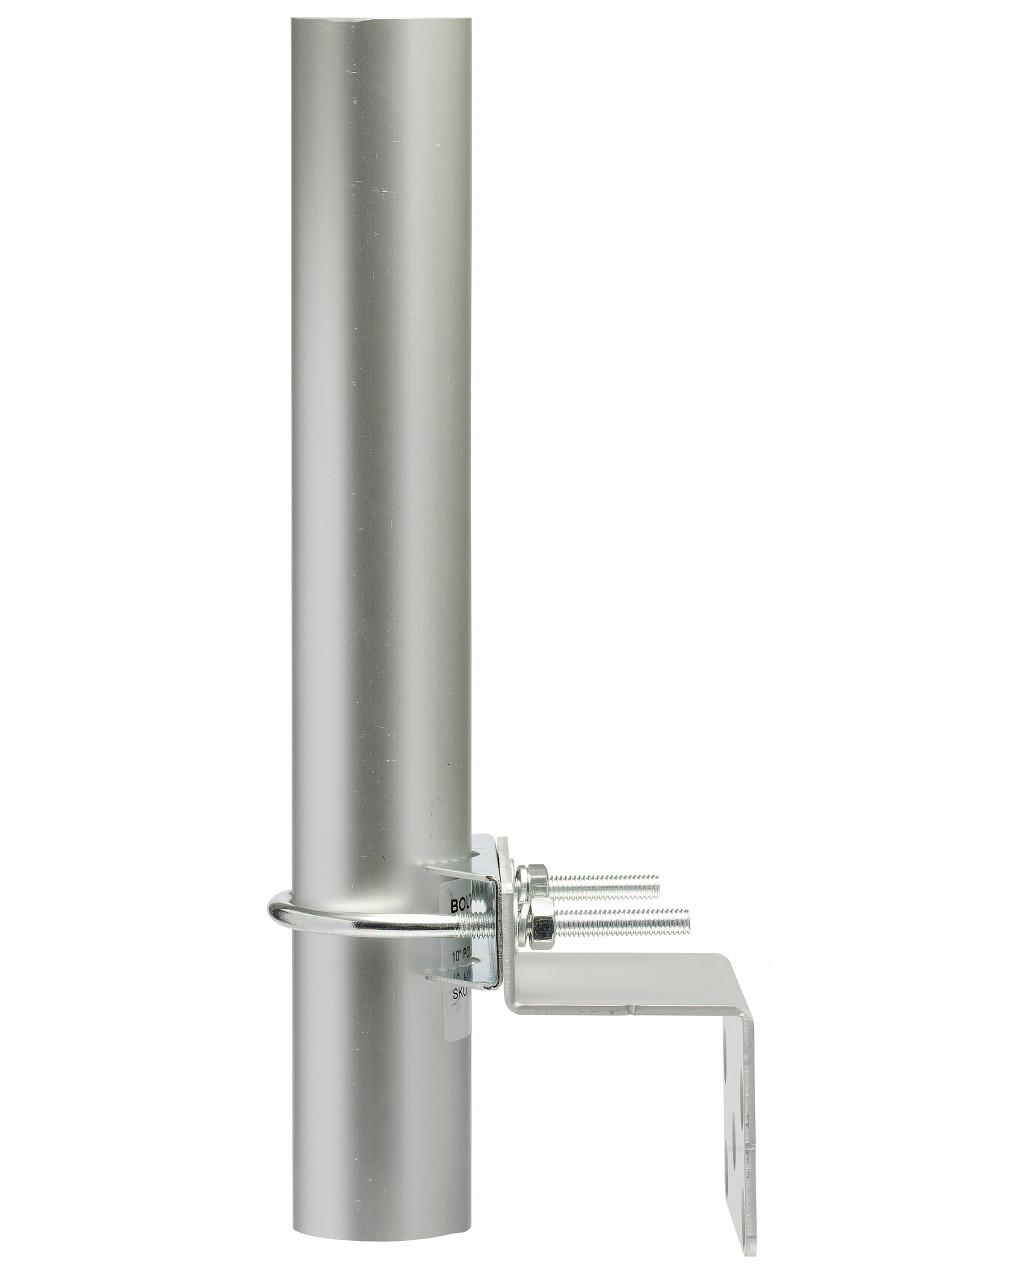 25cm Antenna Mounting Pole